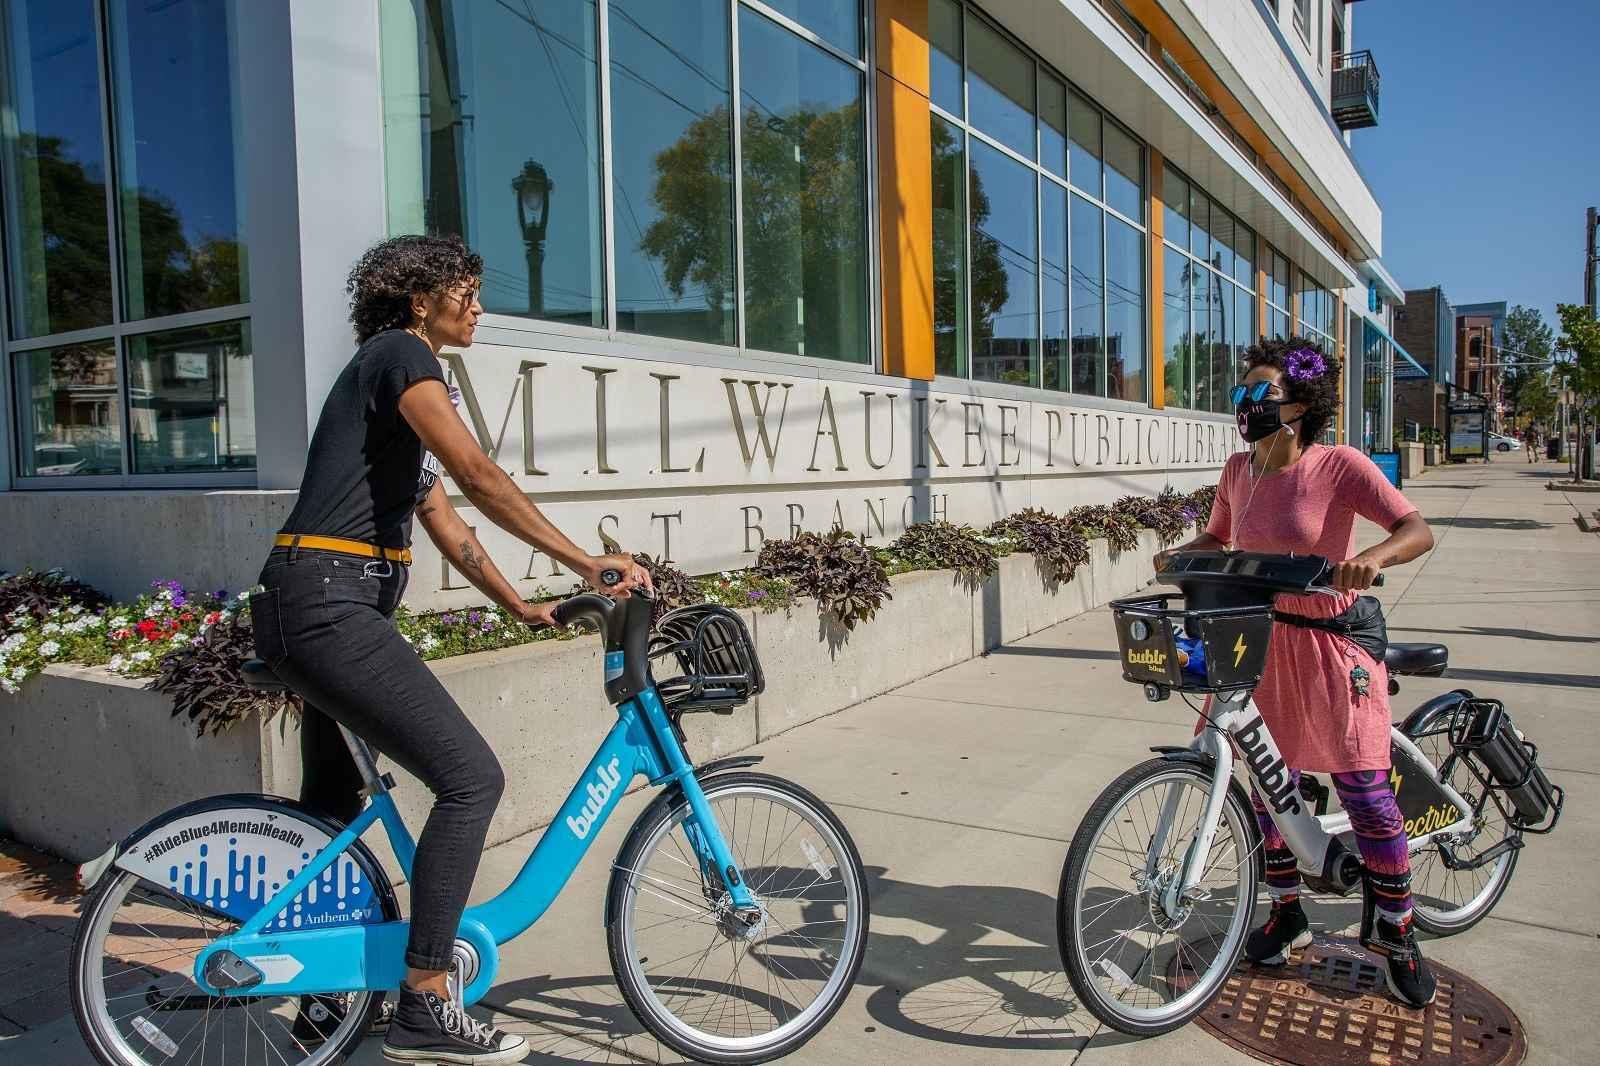 Bublr is your community based nonprofit bikeshare! image